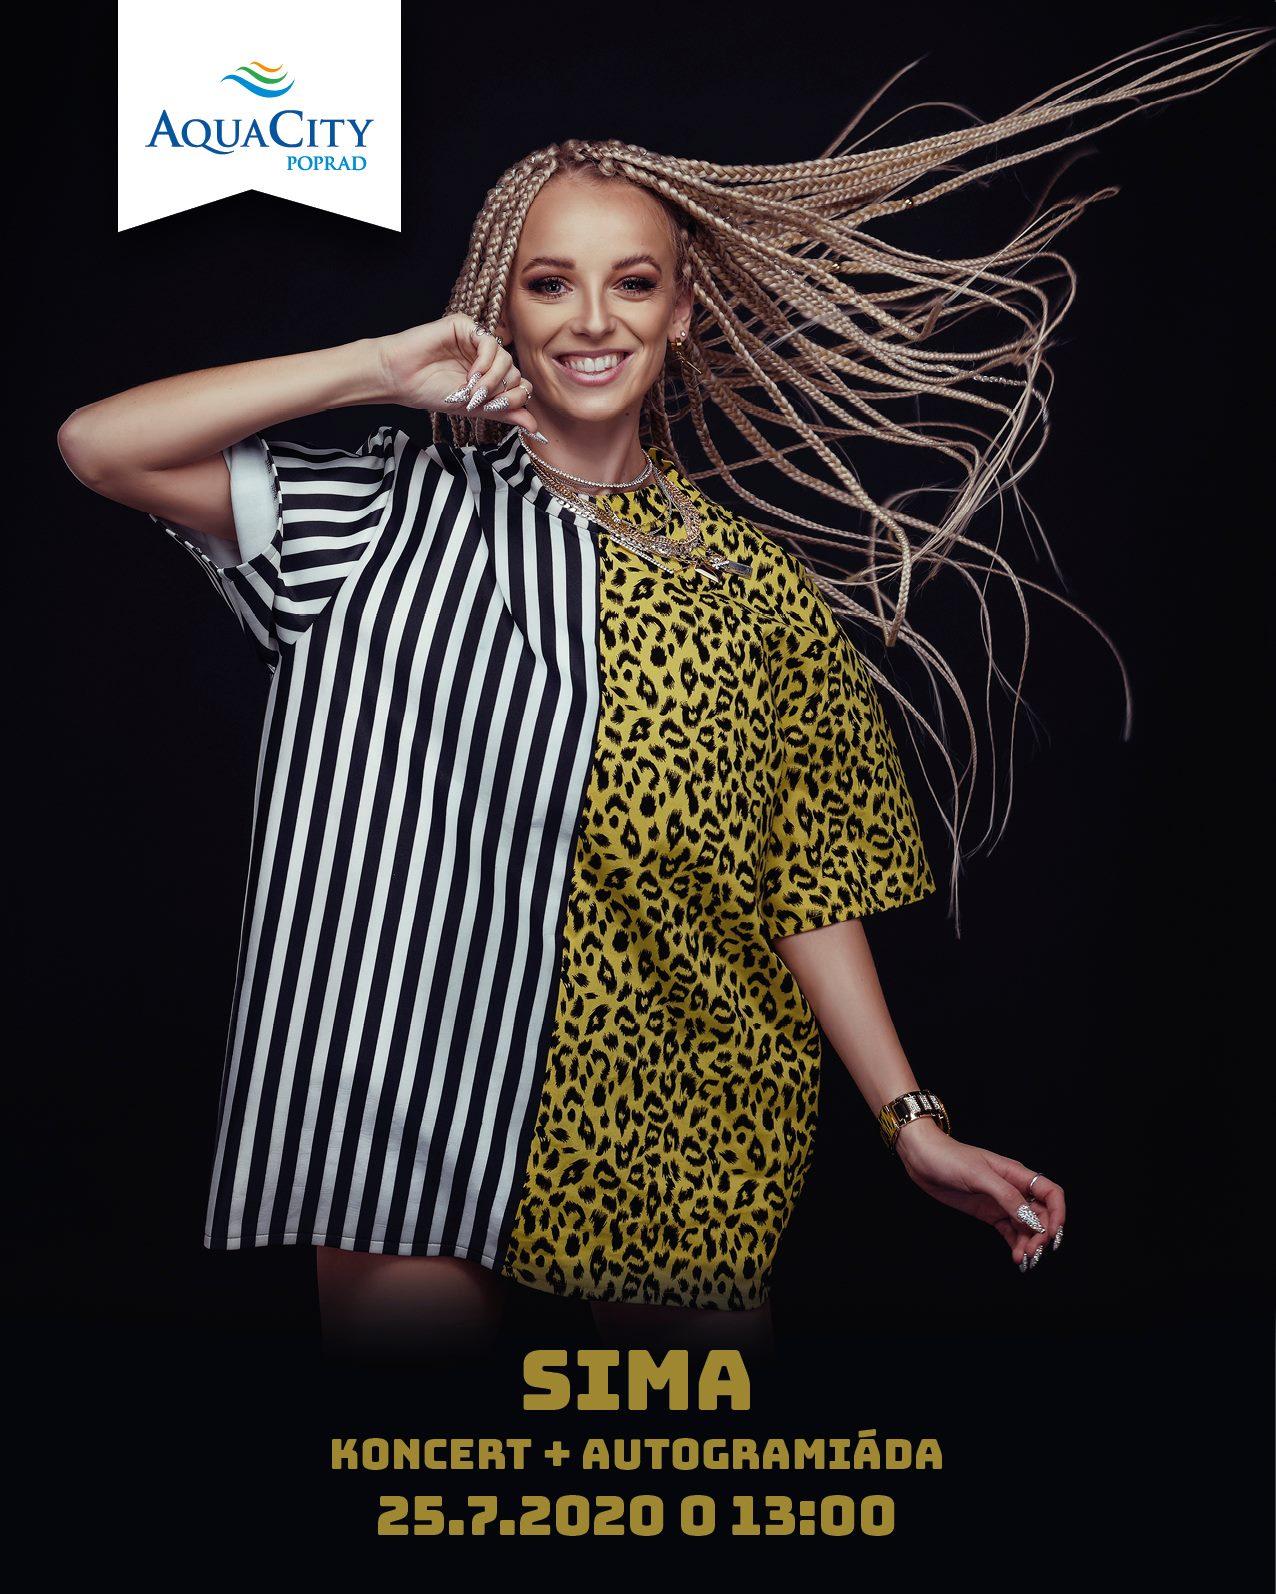 SIMA - koncert a autogramiáda v AquaCity Poprad